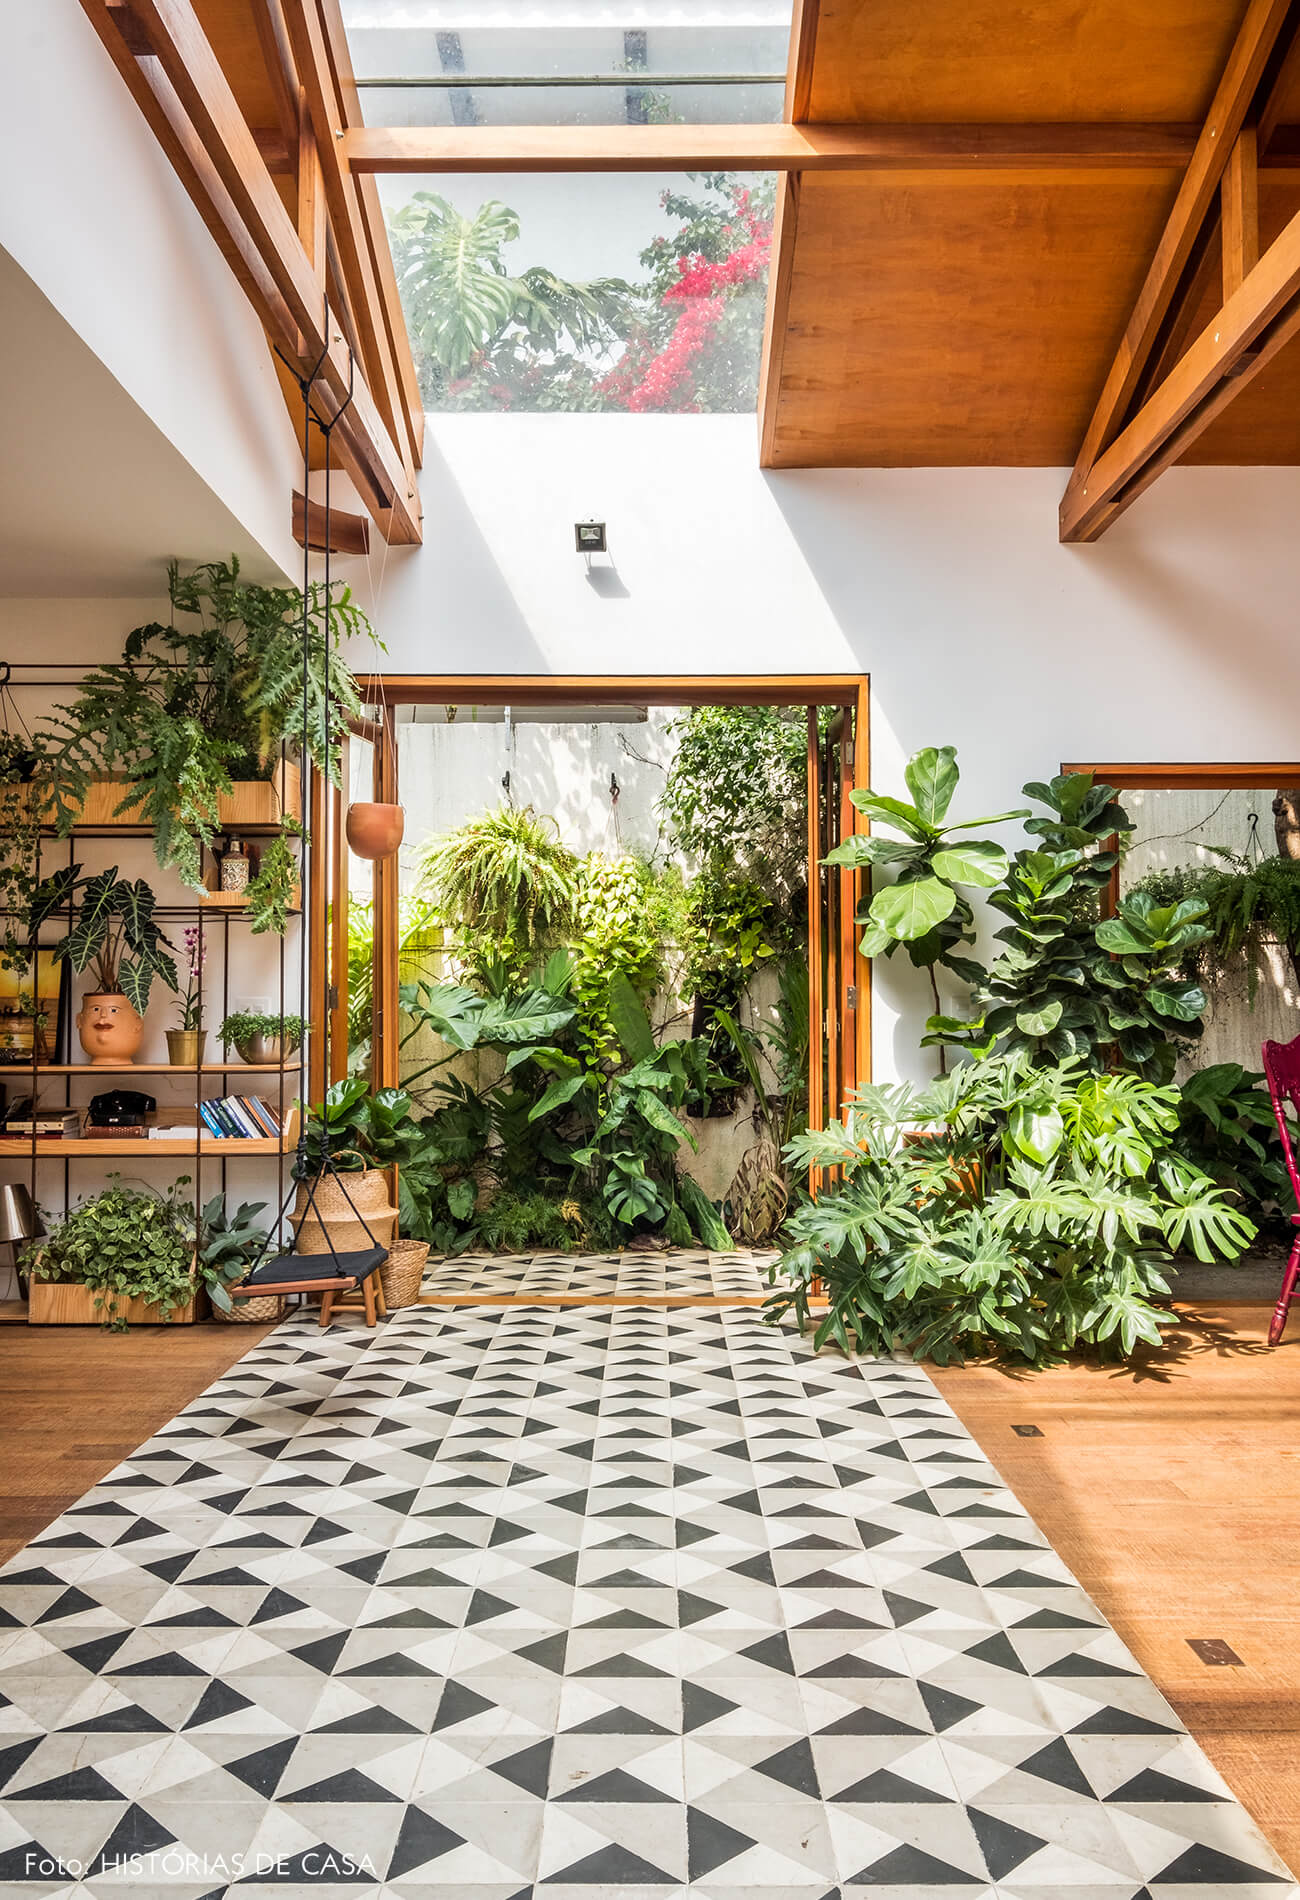 Sala com claraboia e piso de ladrilhos hidráulicos